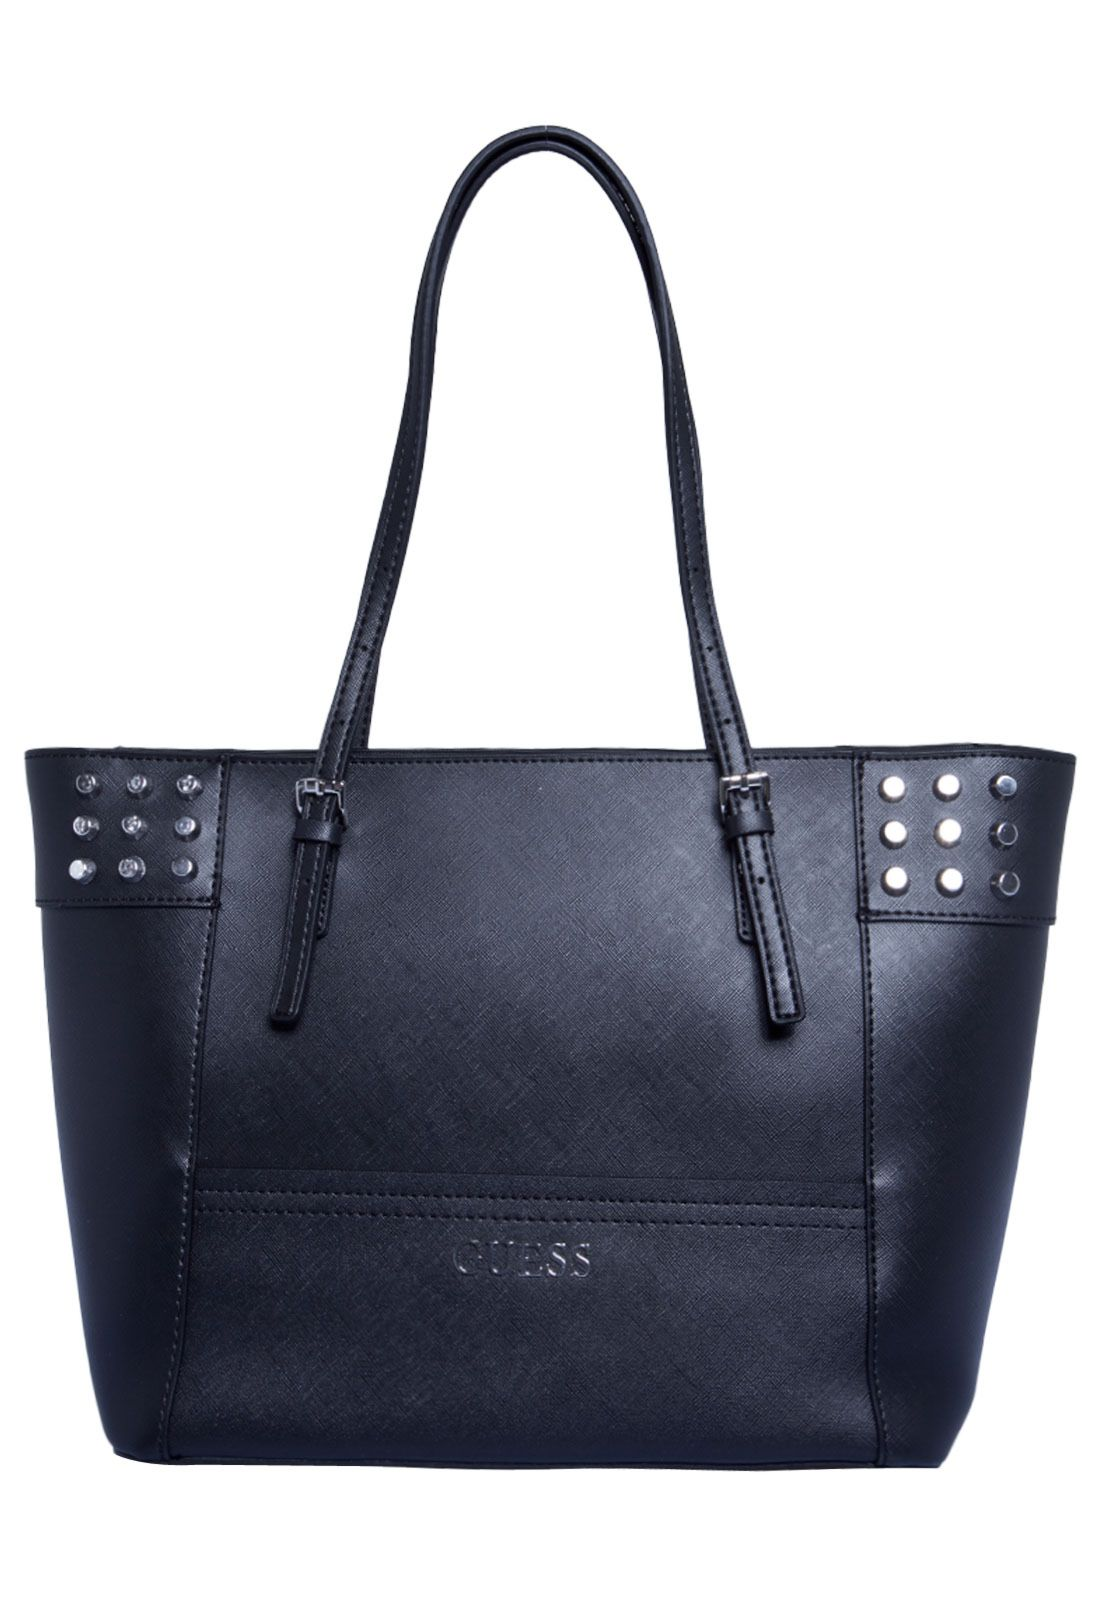 Y Bolsa Bag Shoes Guess PretaBagsTote OP8n0wk